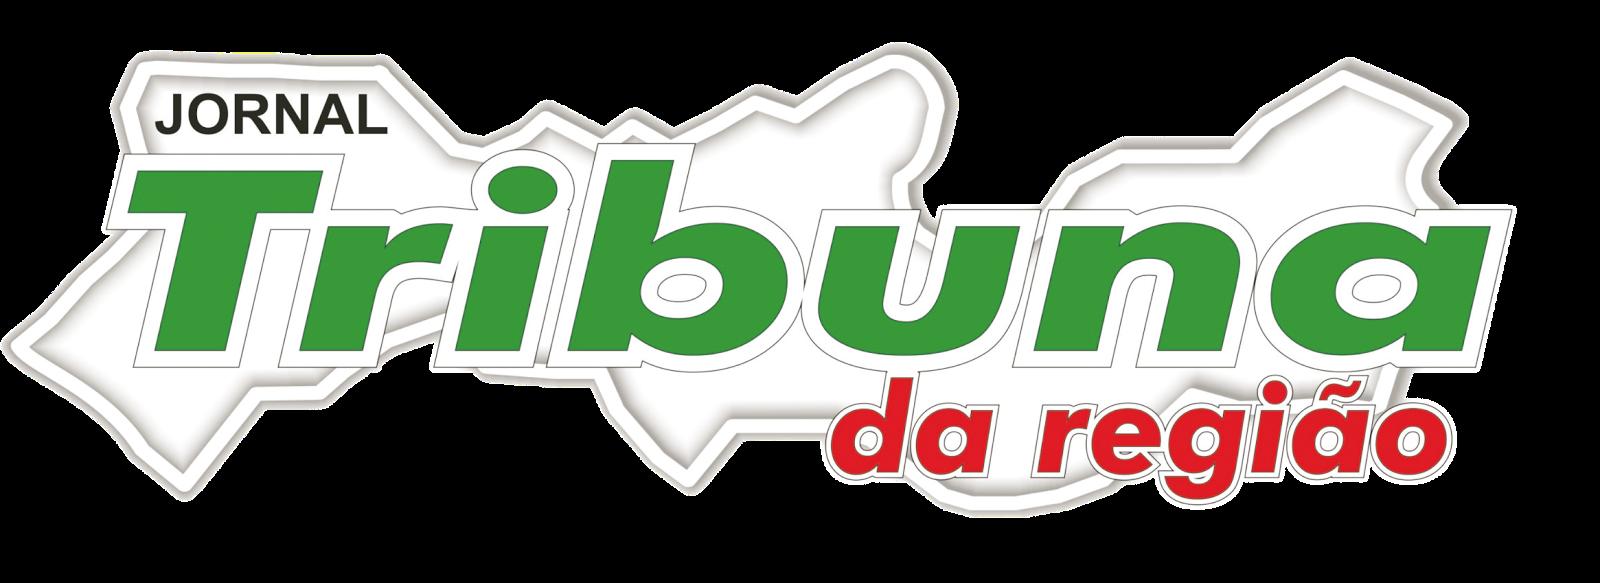 Jornal Tribuna da Região